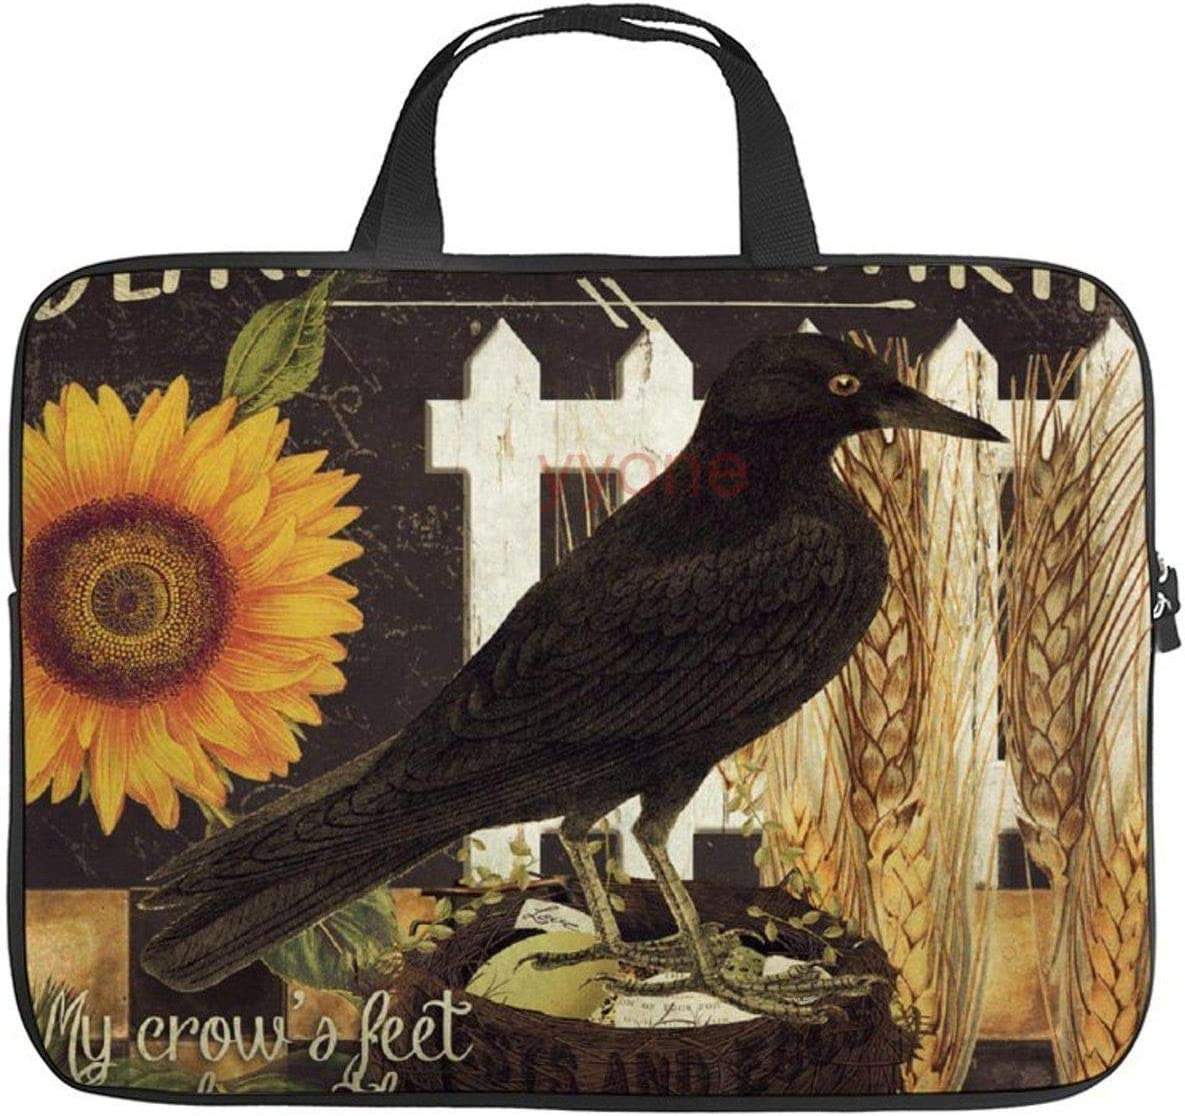 Neoprene Sleeve Laptop Handbag Case Cover Black Crow Farms Patchword Portable MacBook Laptop/Ultrabooks Case Bag Cover 13-13.3 Inch